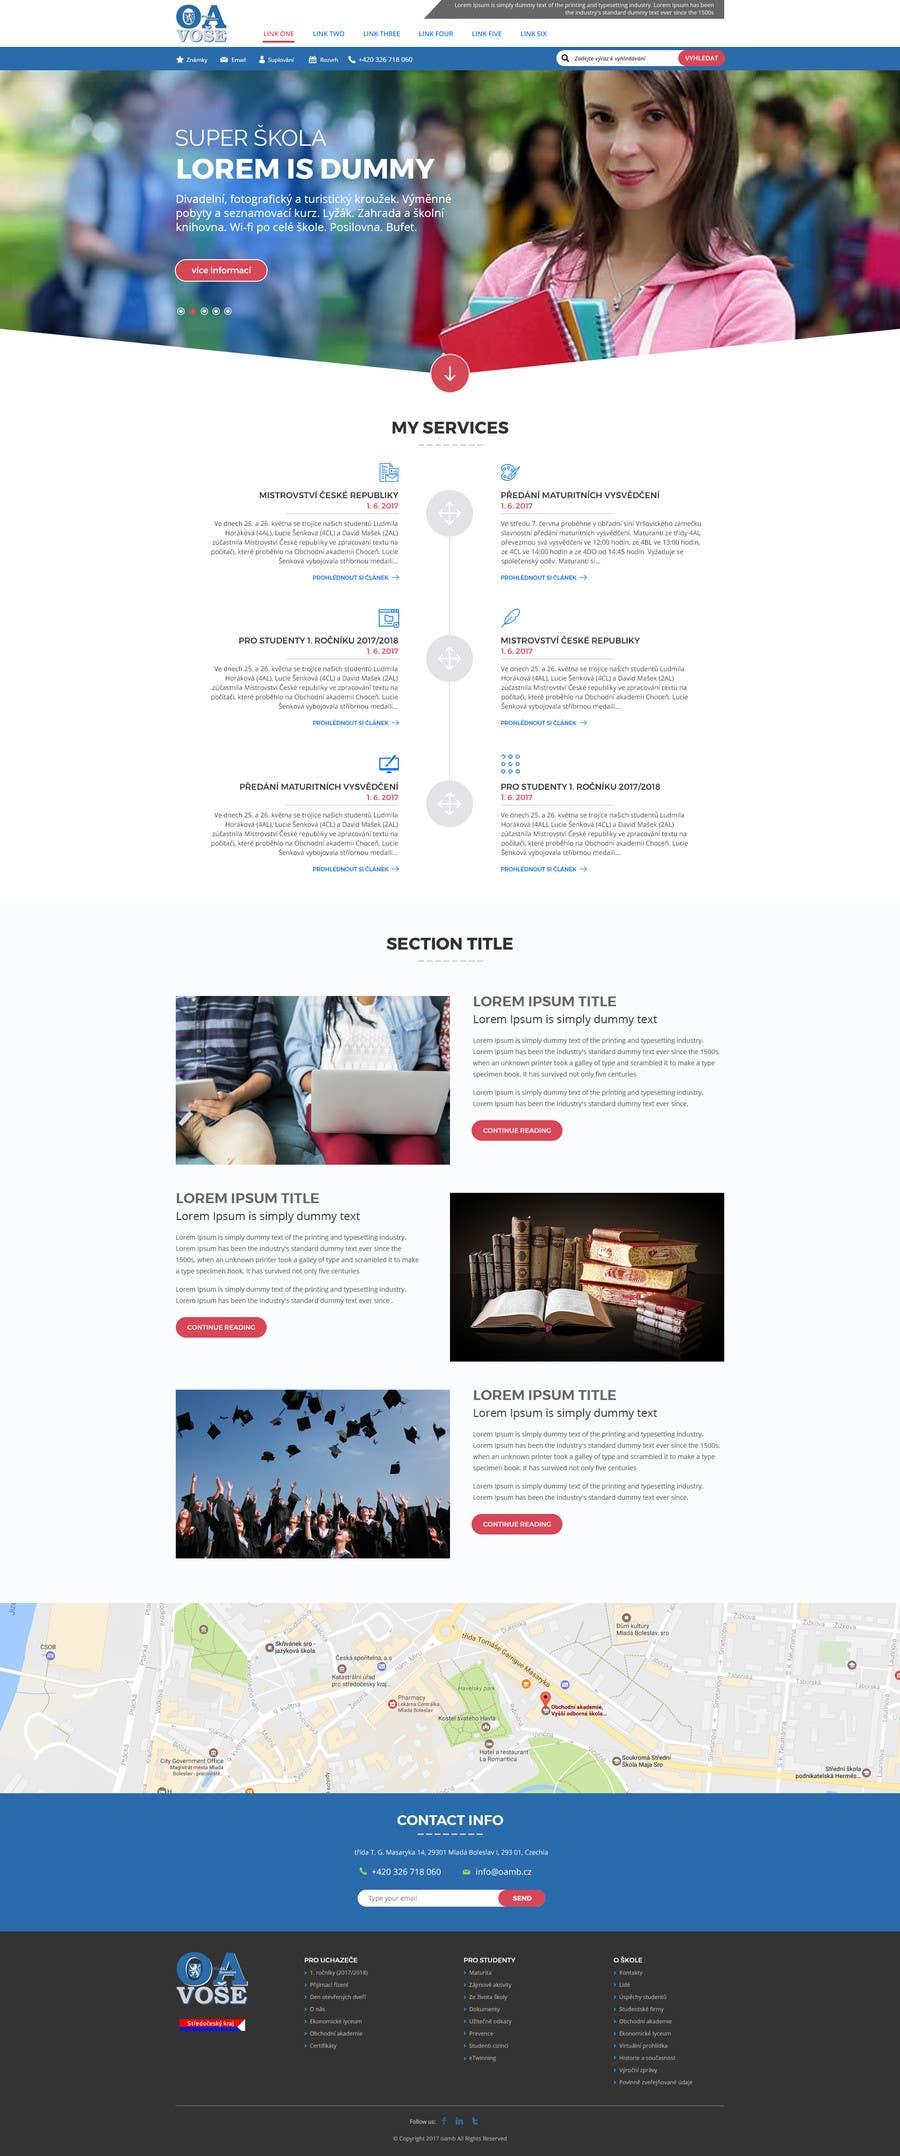 Contest Entry #                                        23                                      for                                         Design a Website Mockup